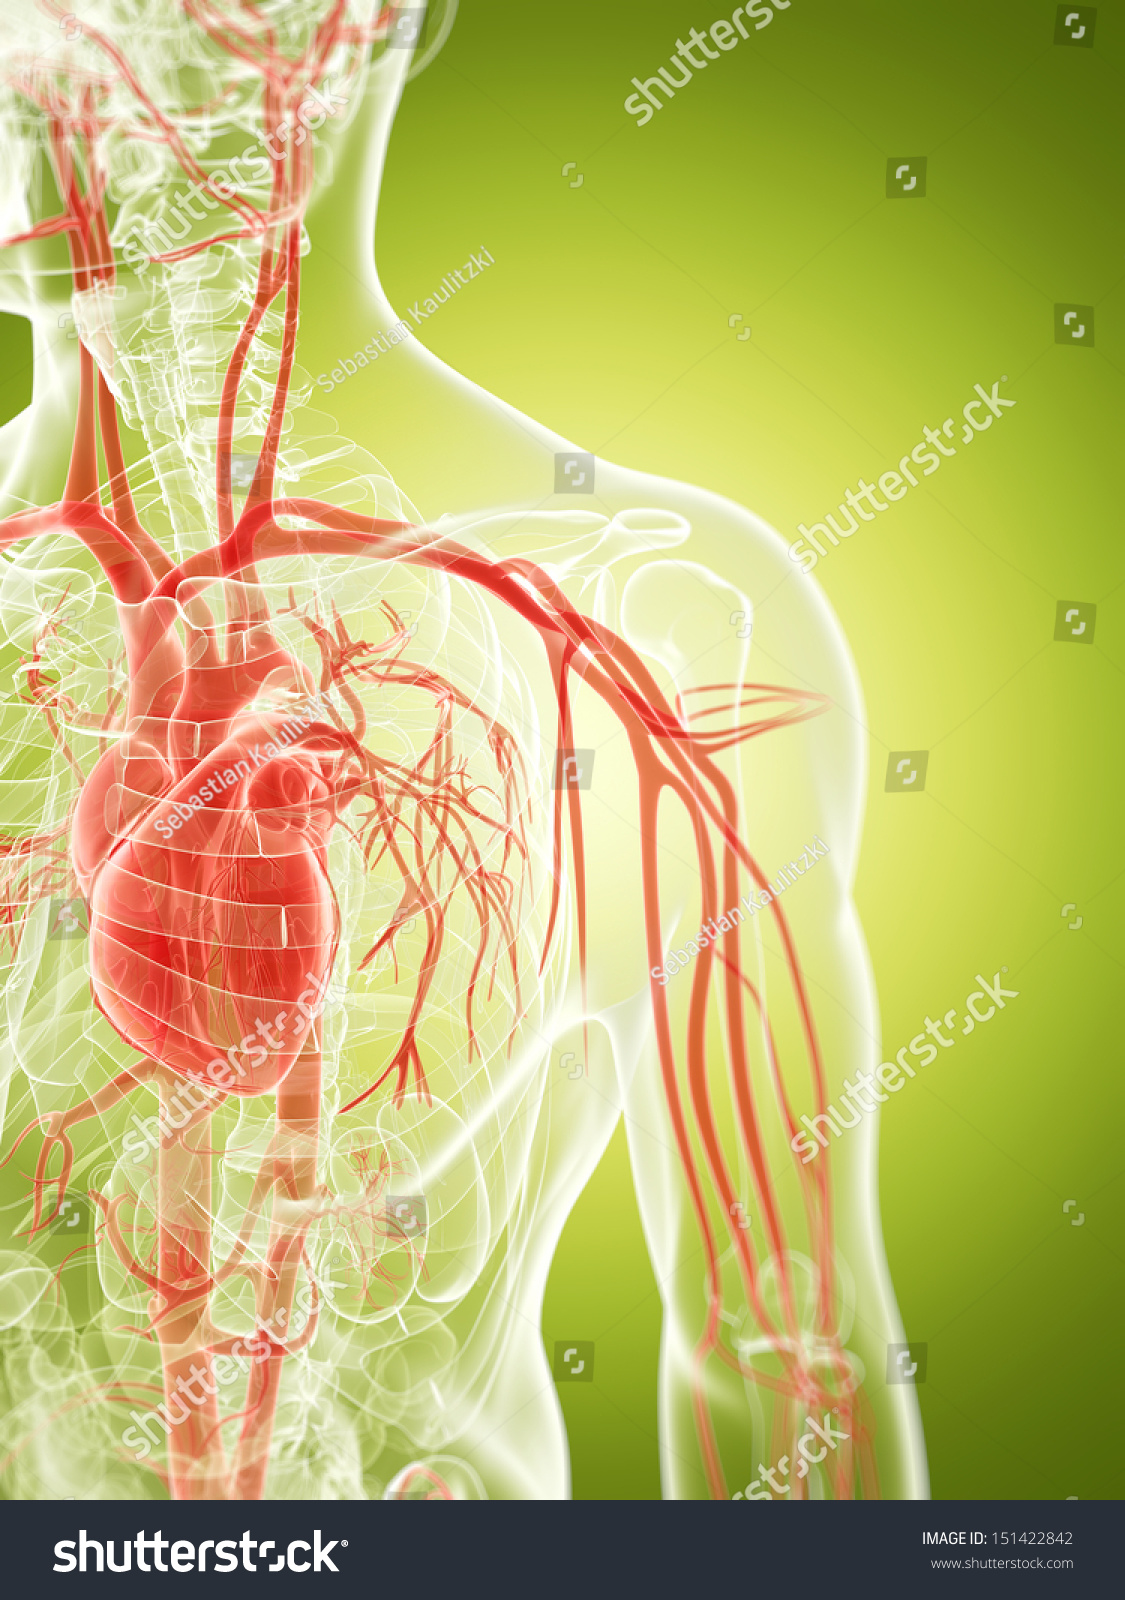 3 D Rendered Illustration Vascular System Stock Illustration